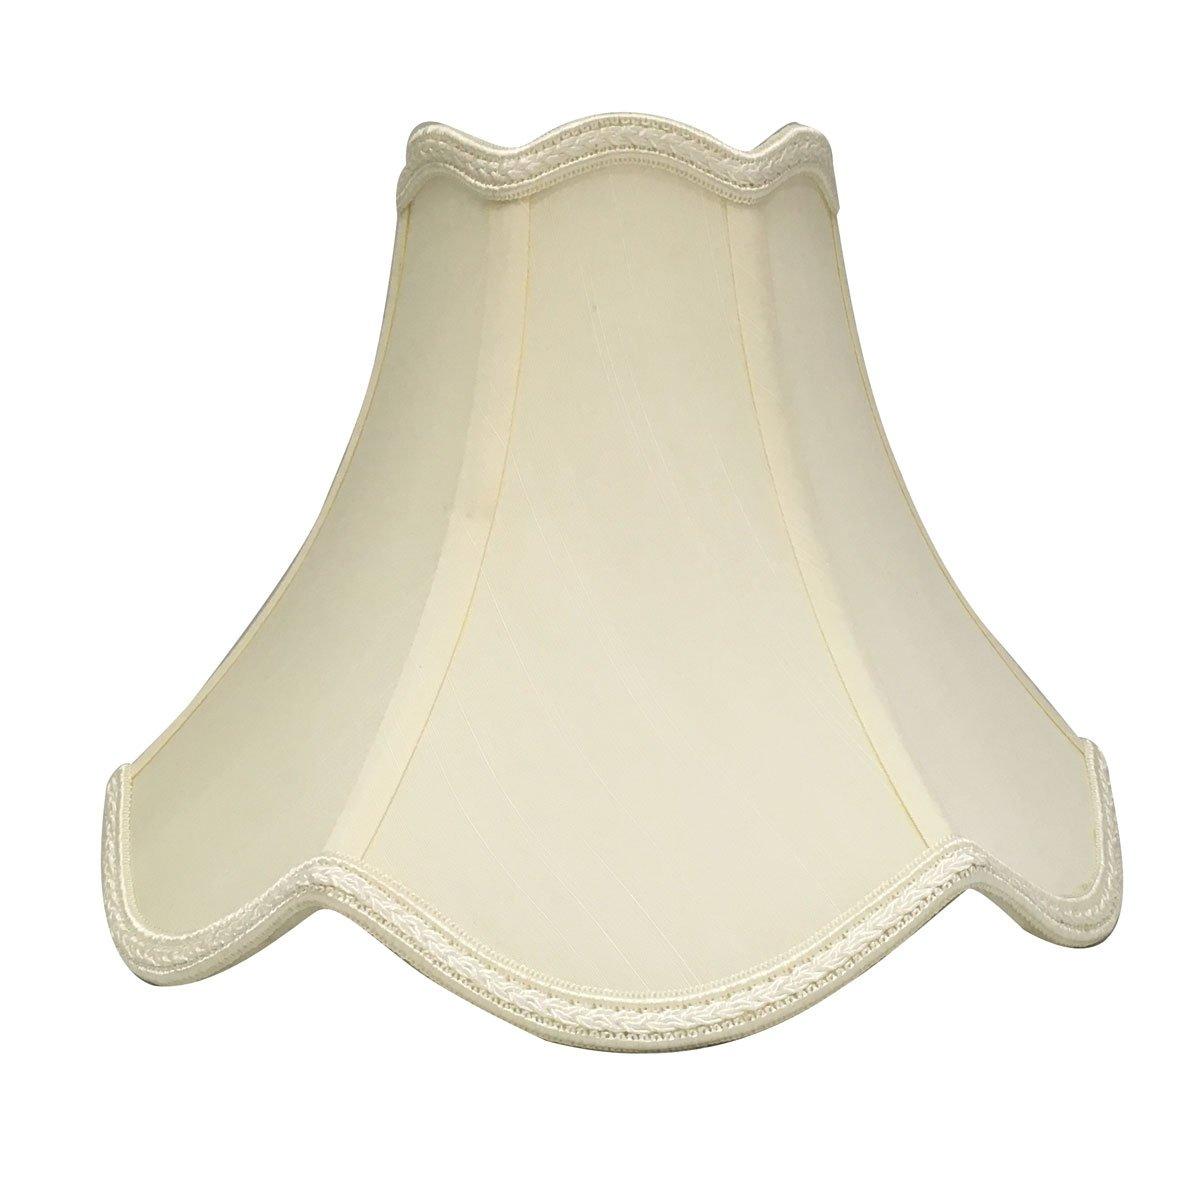 Royal Designs Scalloped Bell Designer Lamp Shade, Eggshell, 7.5 x 18 x 12